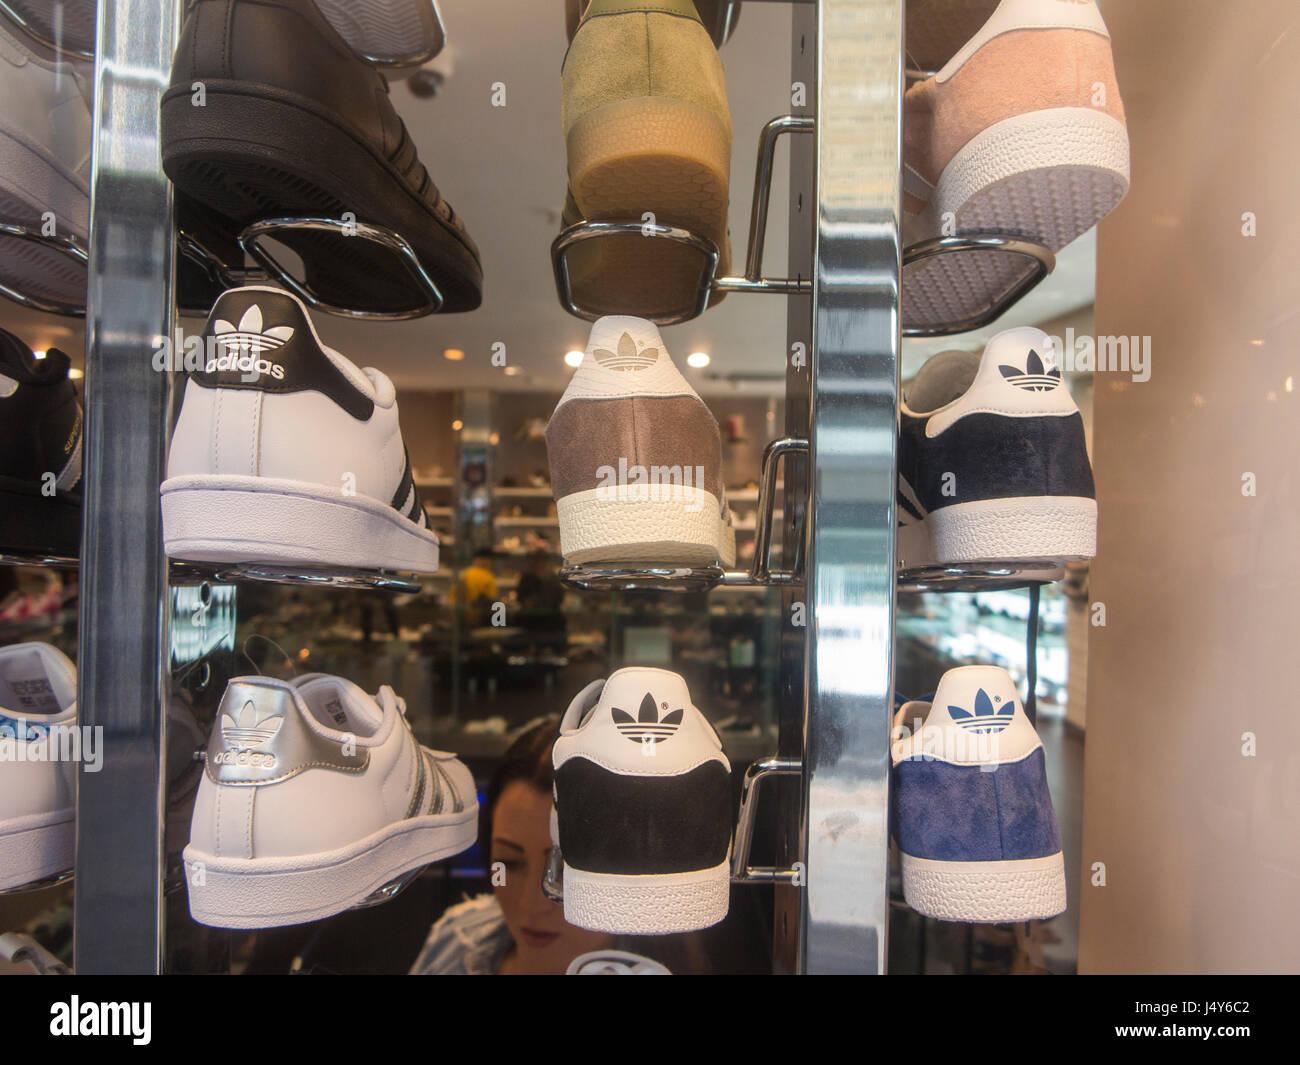 la marque formateurs adidas la formateurs adidas la marque marque formateurs adidas lJK1cTF